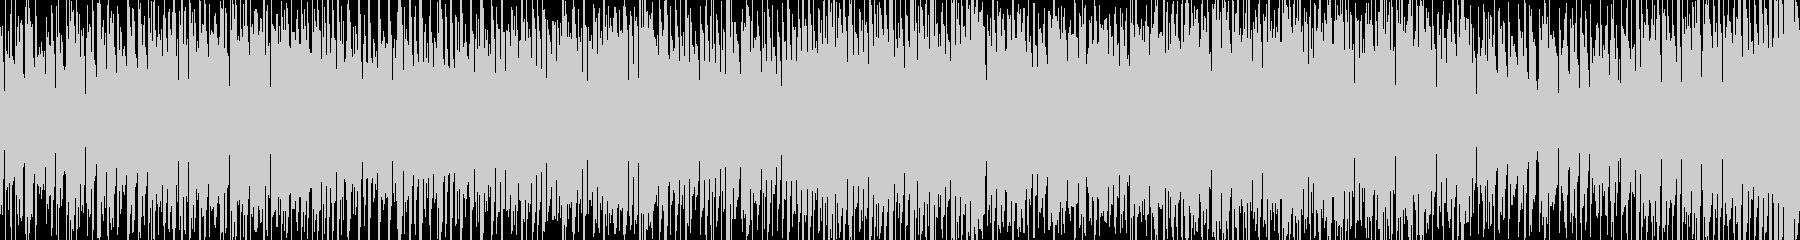 BGM・映像・疾走感・EDM・ループ仕様の未再生の波形